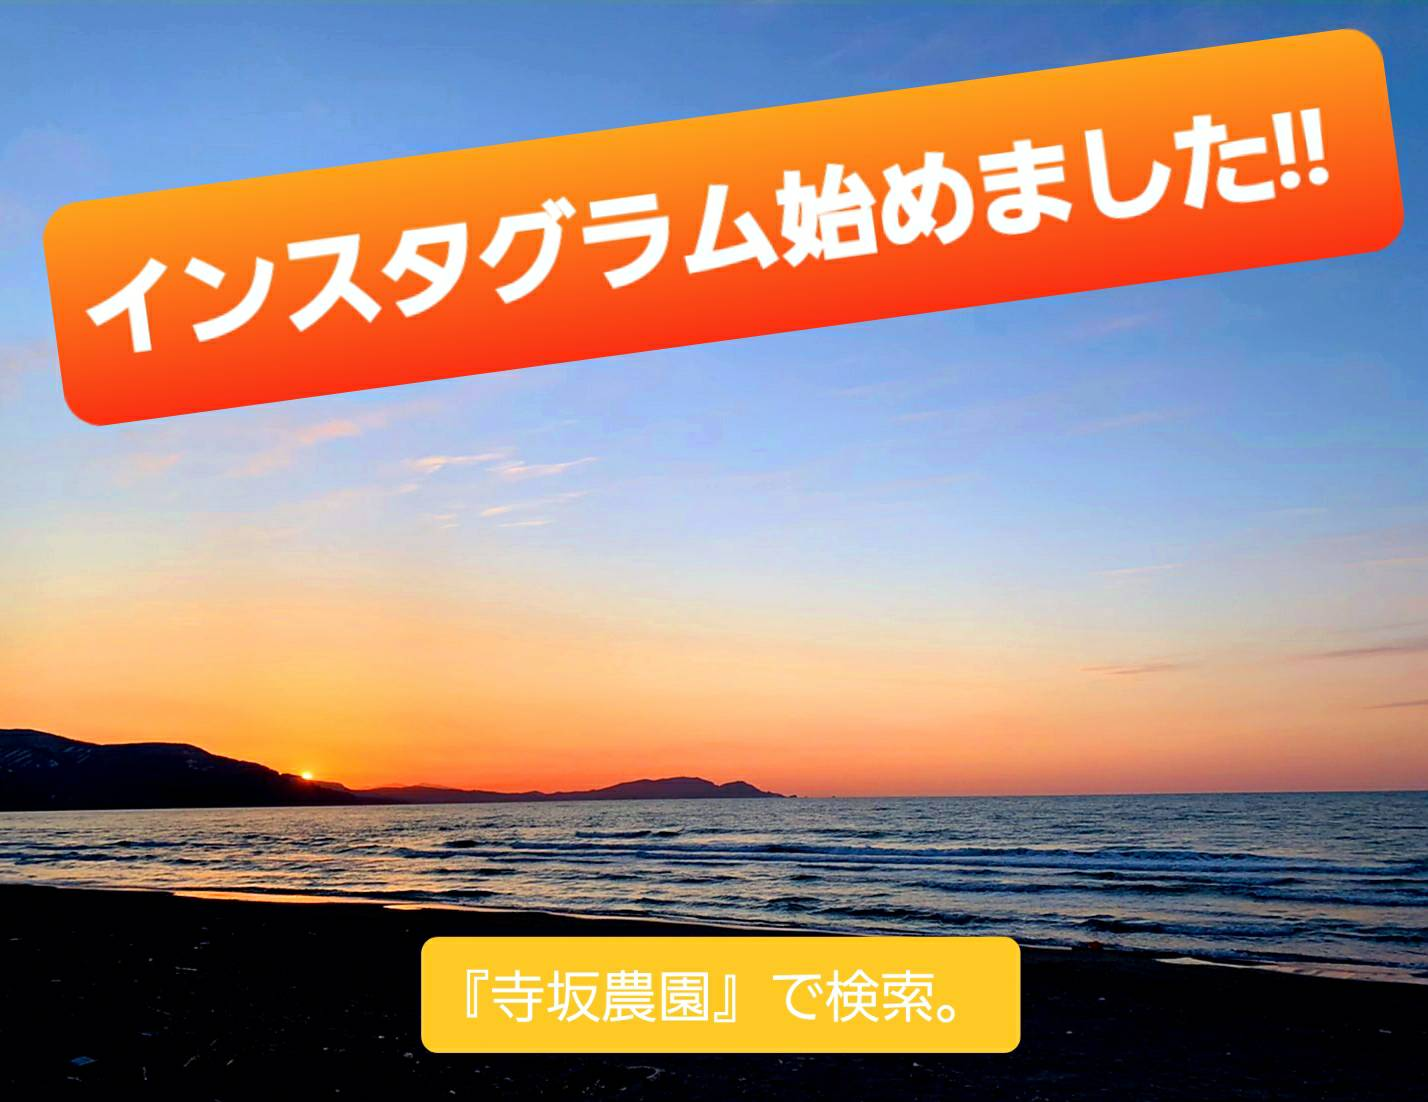 line_oa_chat_200427_165701